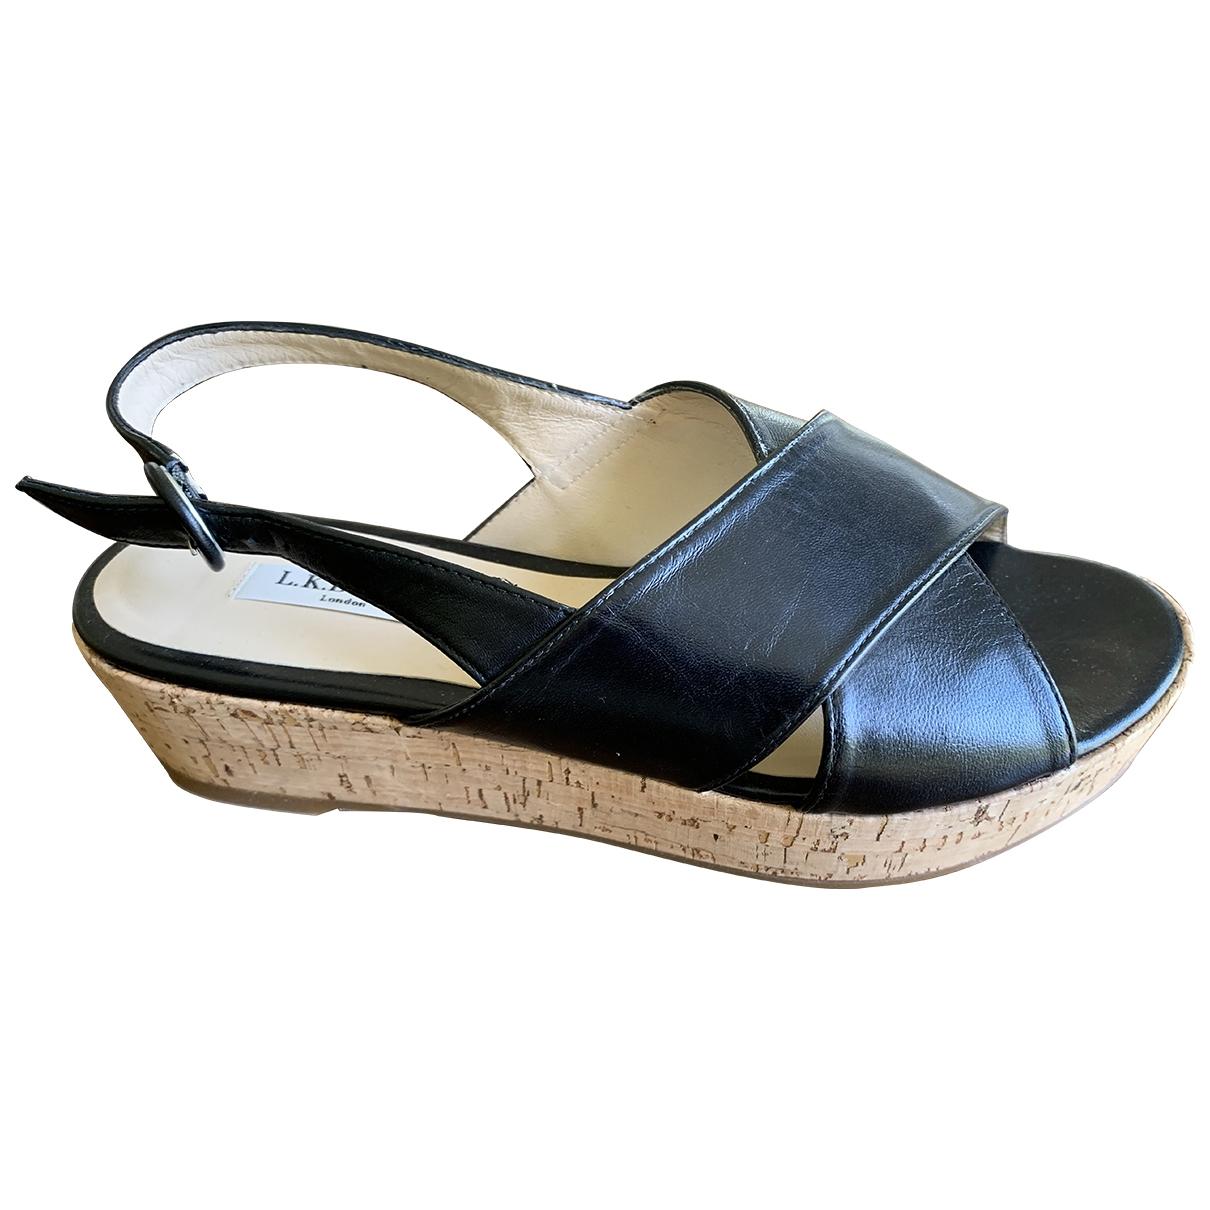 Lk Bennett - Sandales   pour femme en cuir - noir